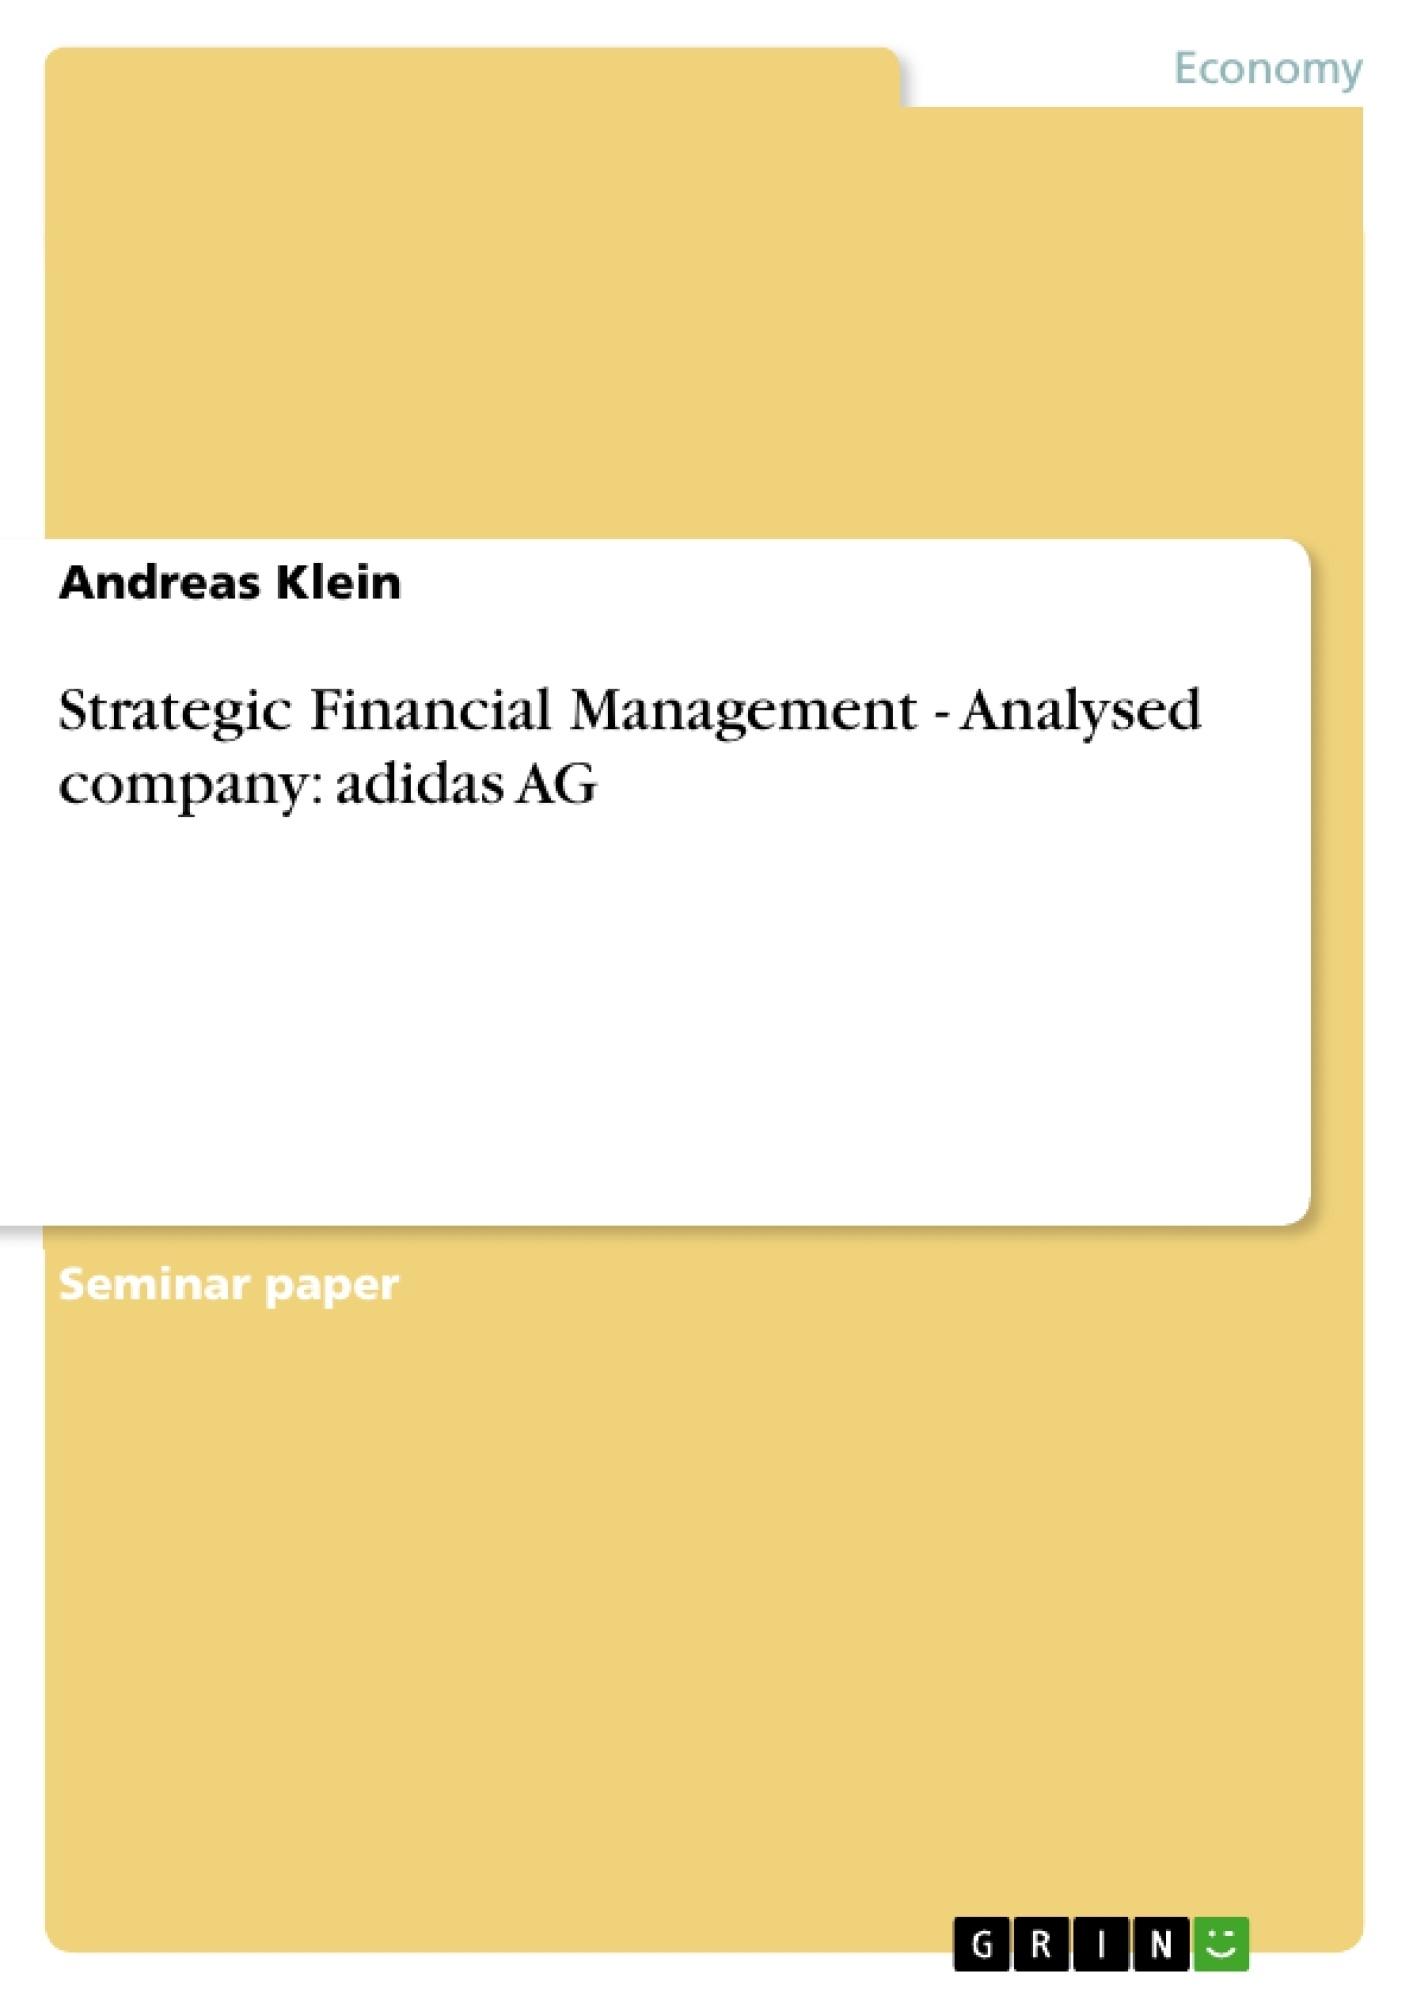 Adidas management paper